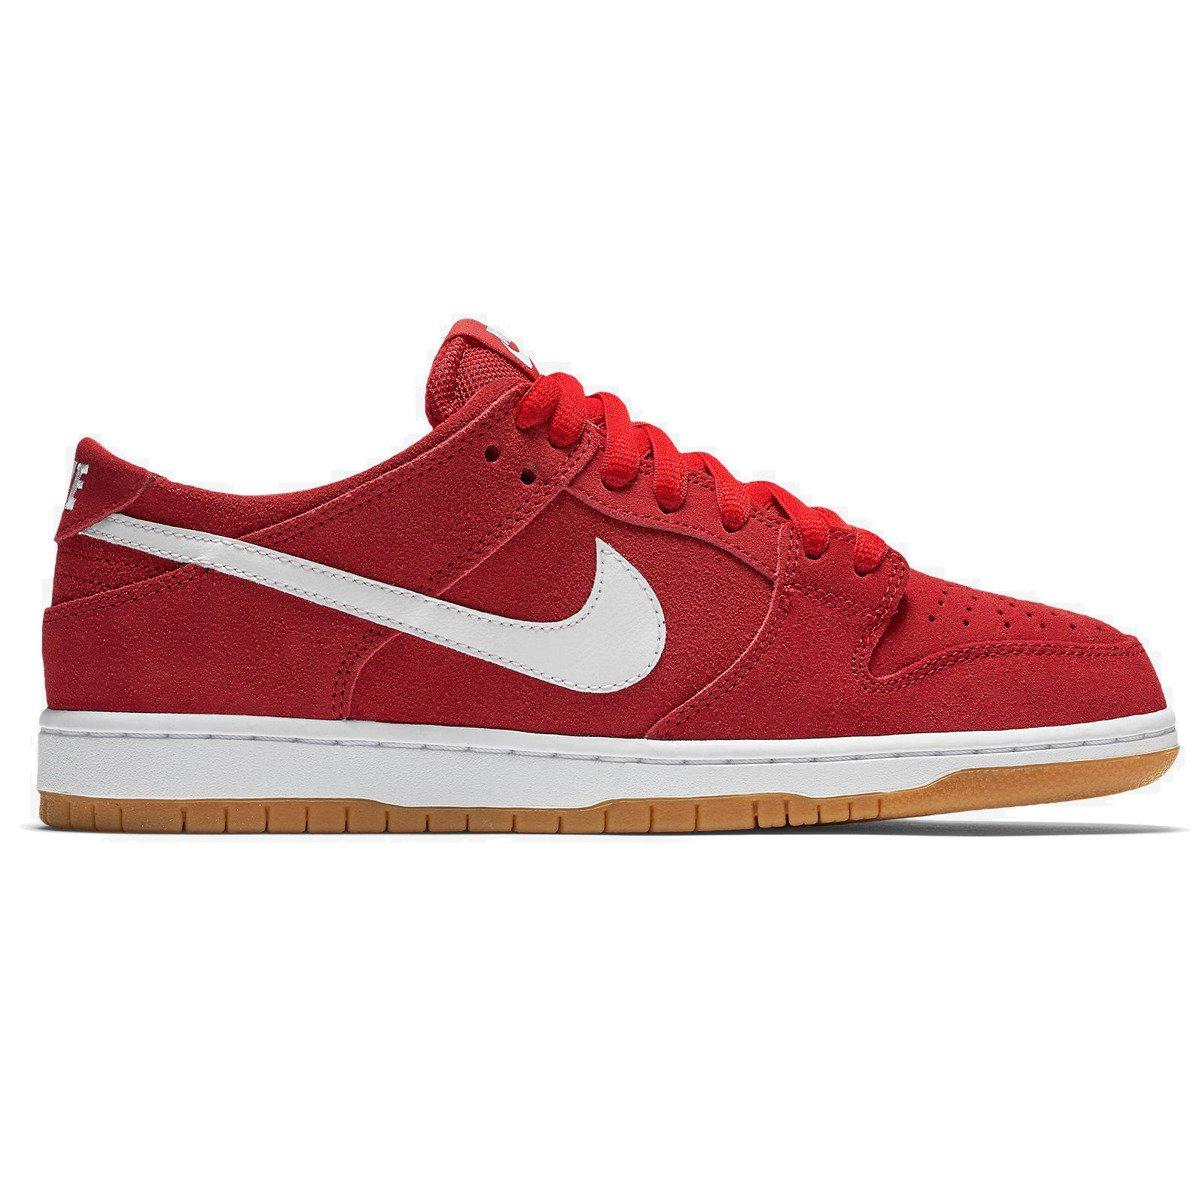 cheap for discount 96f2f 48770 Buty Nike SB Dunk Low Pro Ishod Wair Unvrsty Redwhite-gm Lght Brw red   Shoes  Nike SB SALE  Sale 50% -70%  Shoes Brands  Nike SB Buty  Nike SB  ...